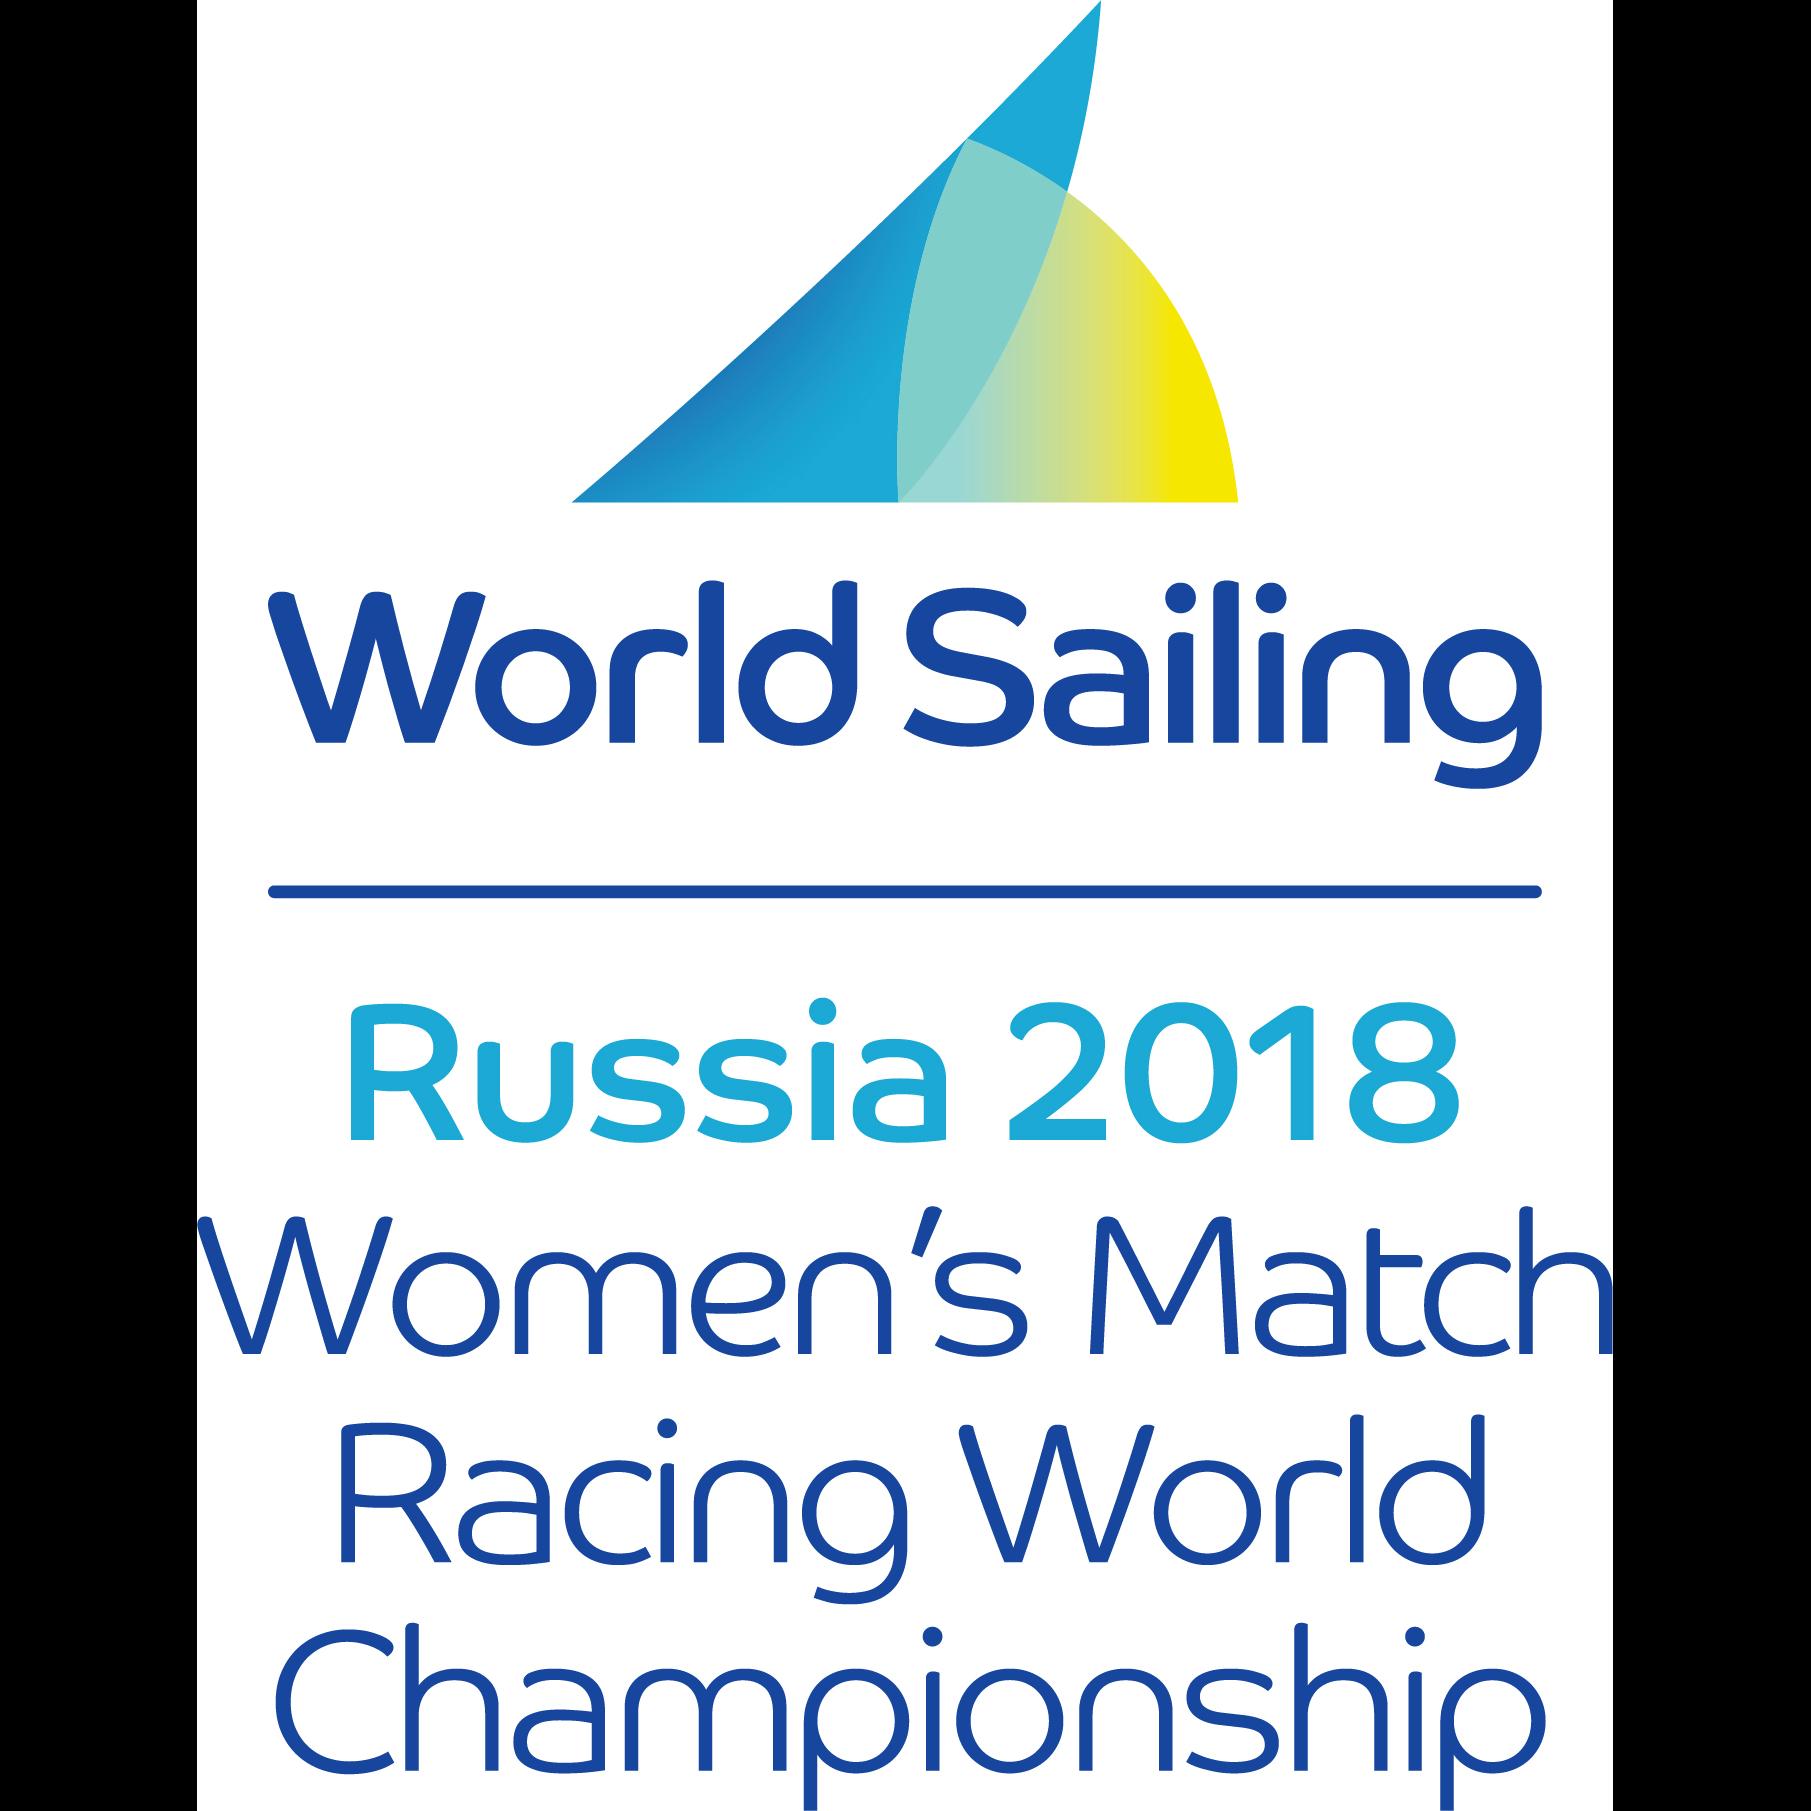 2018 Women's Match Racing World Championship